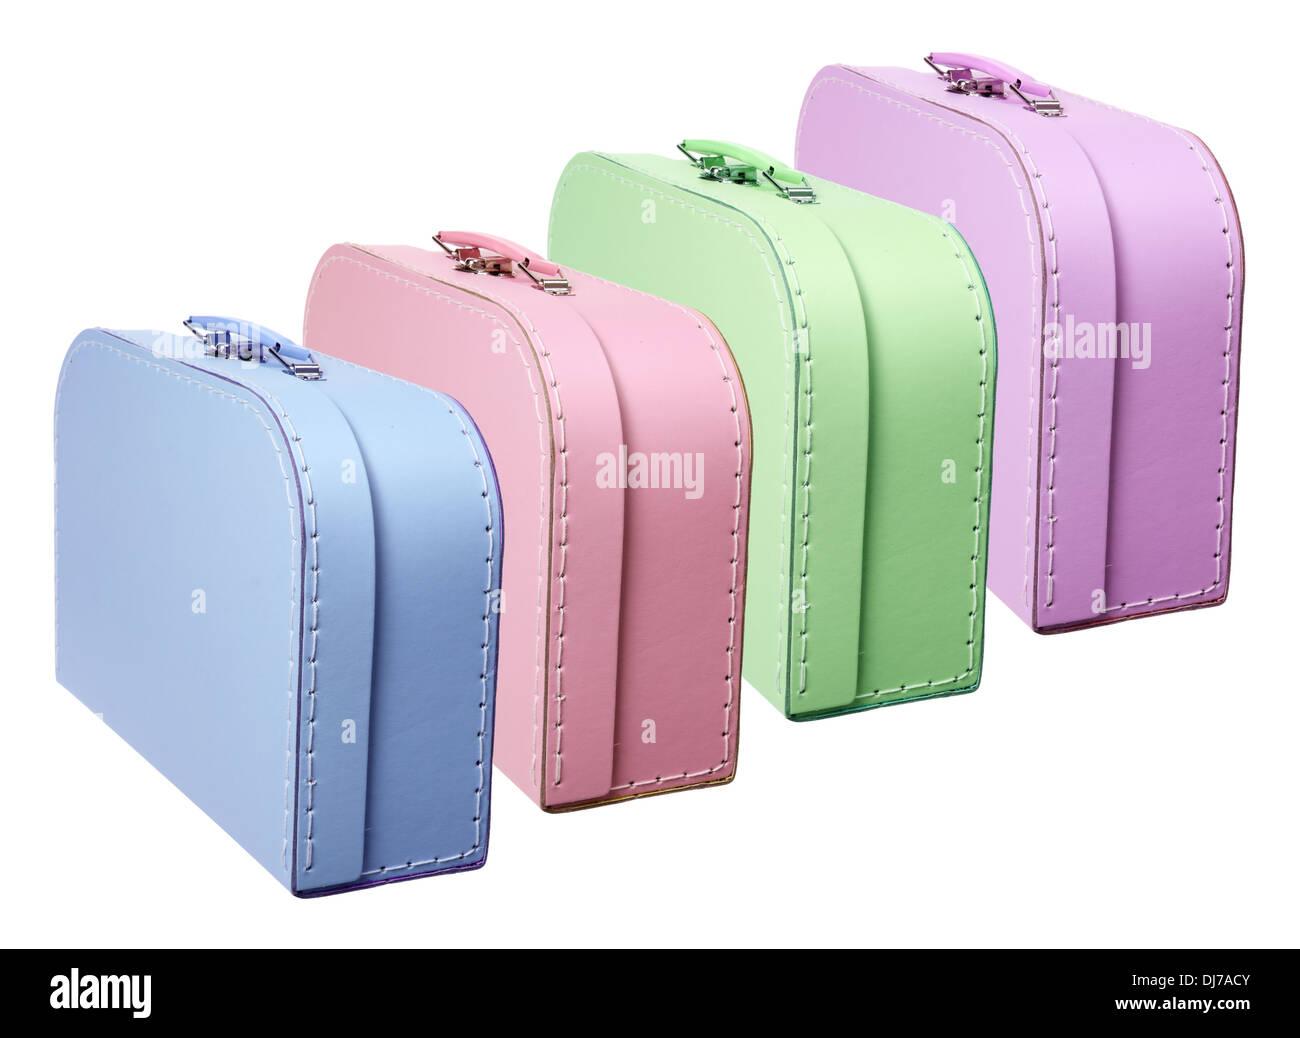 Mini Suitcases - Stock Image